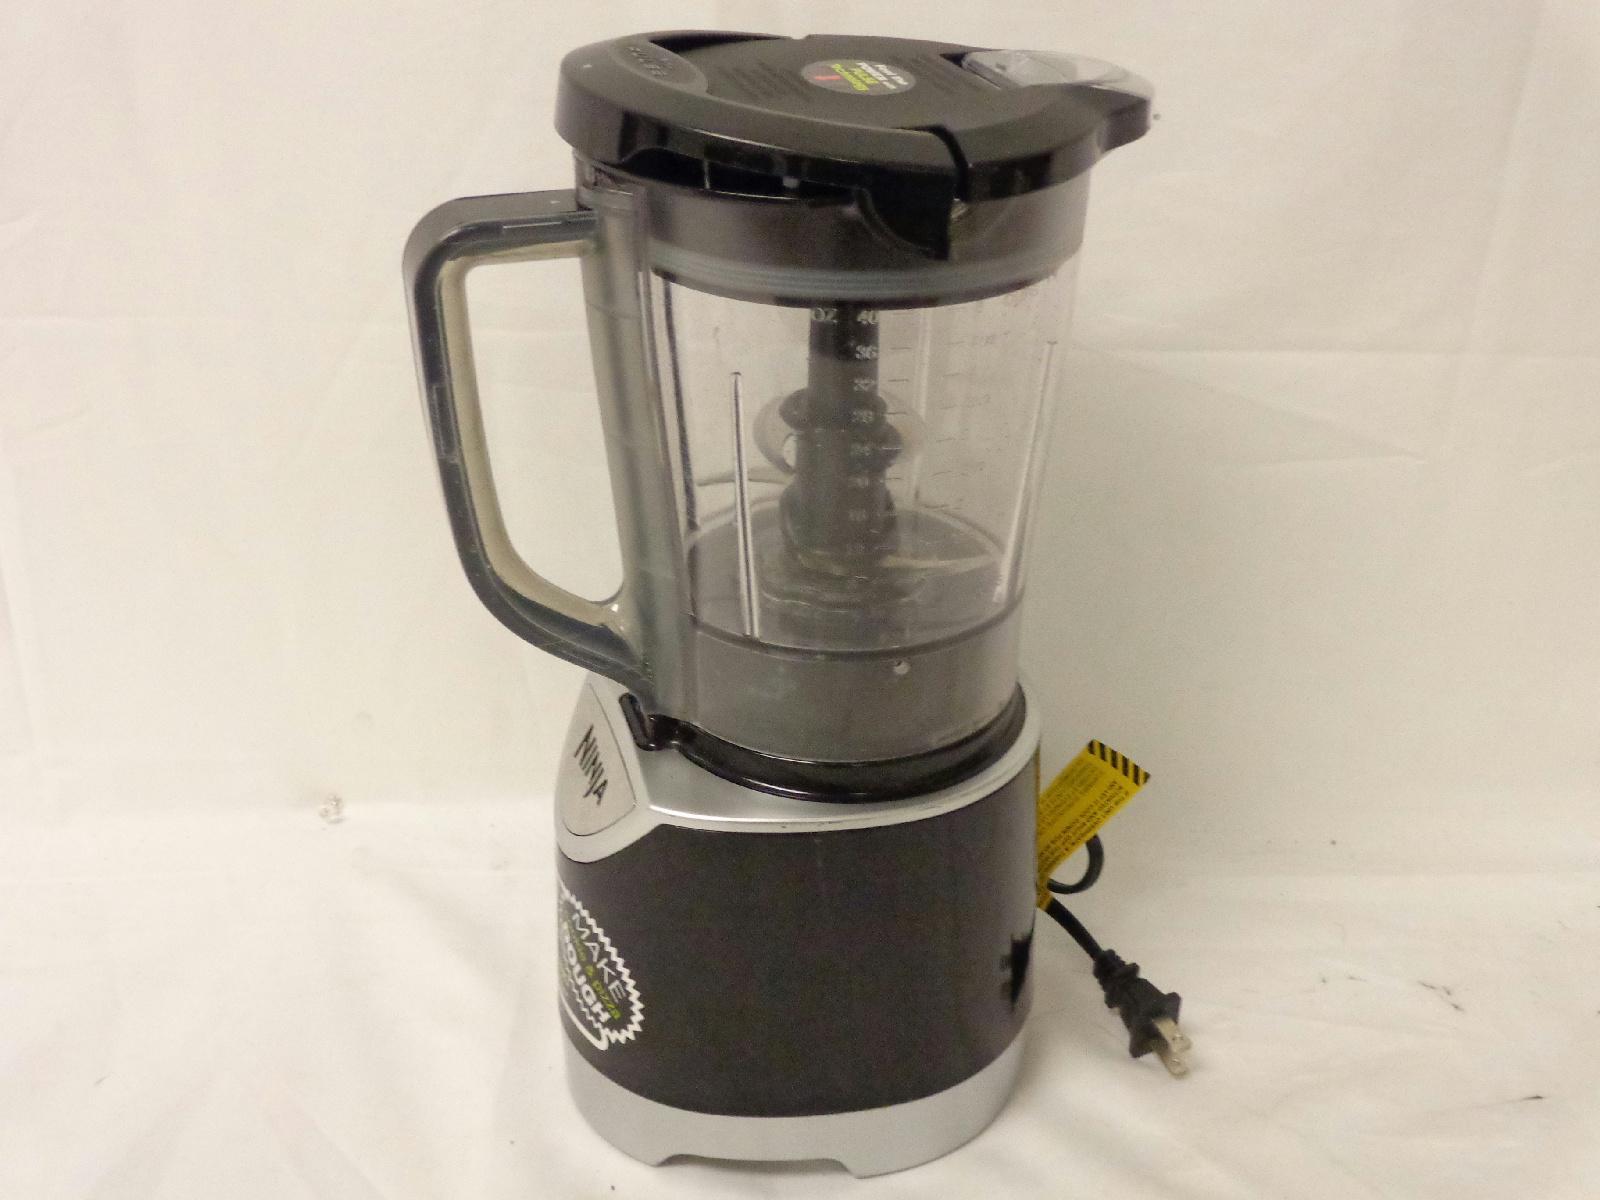 Ninja Kitchen System Pulse Bl201 30 Blender Juicer Mixer Processor Black Ebay